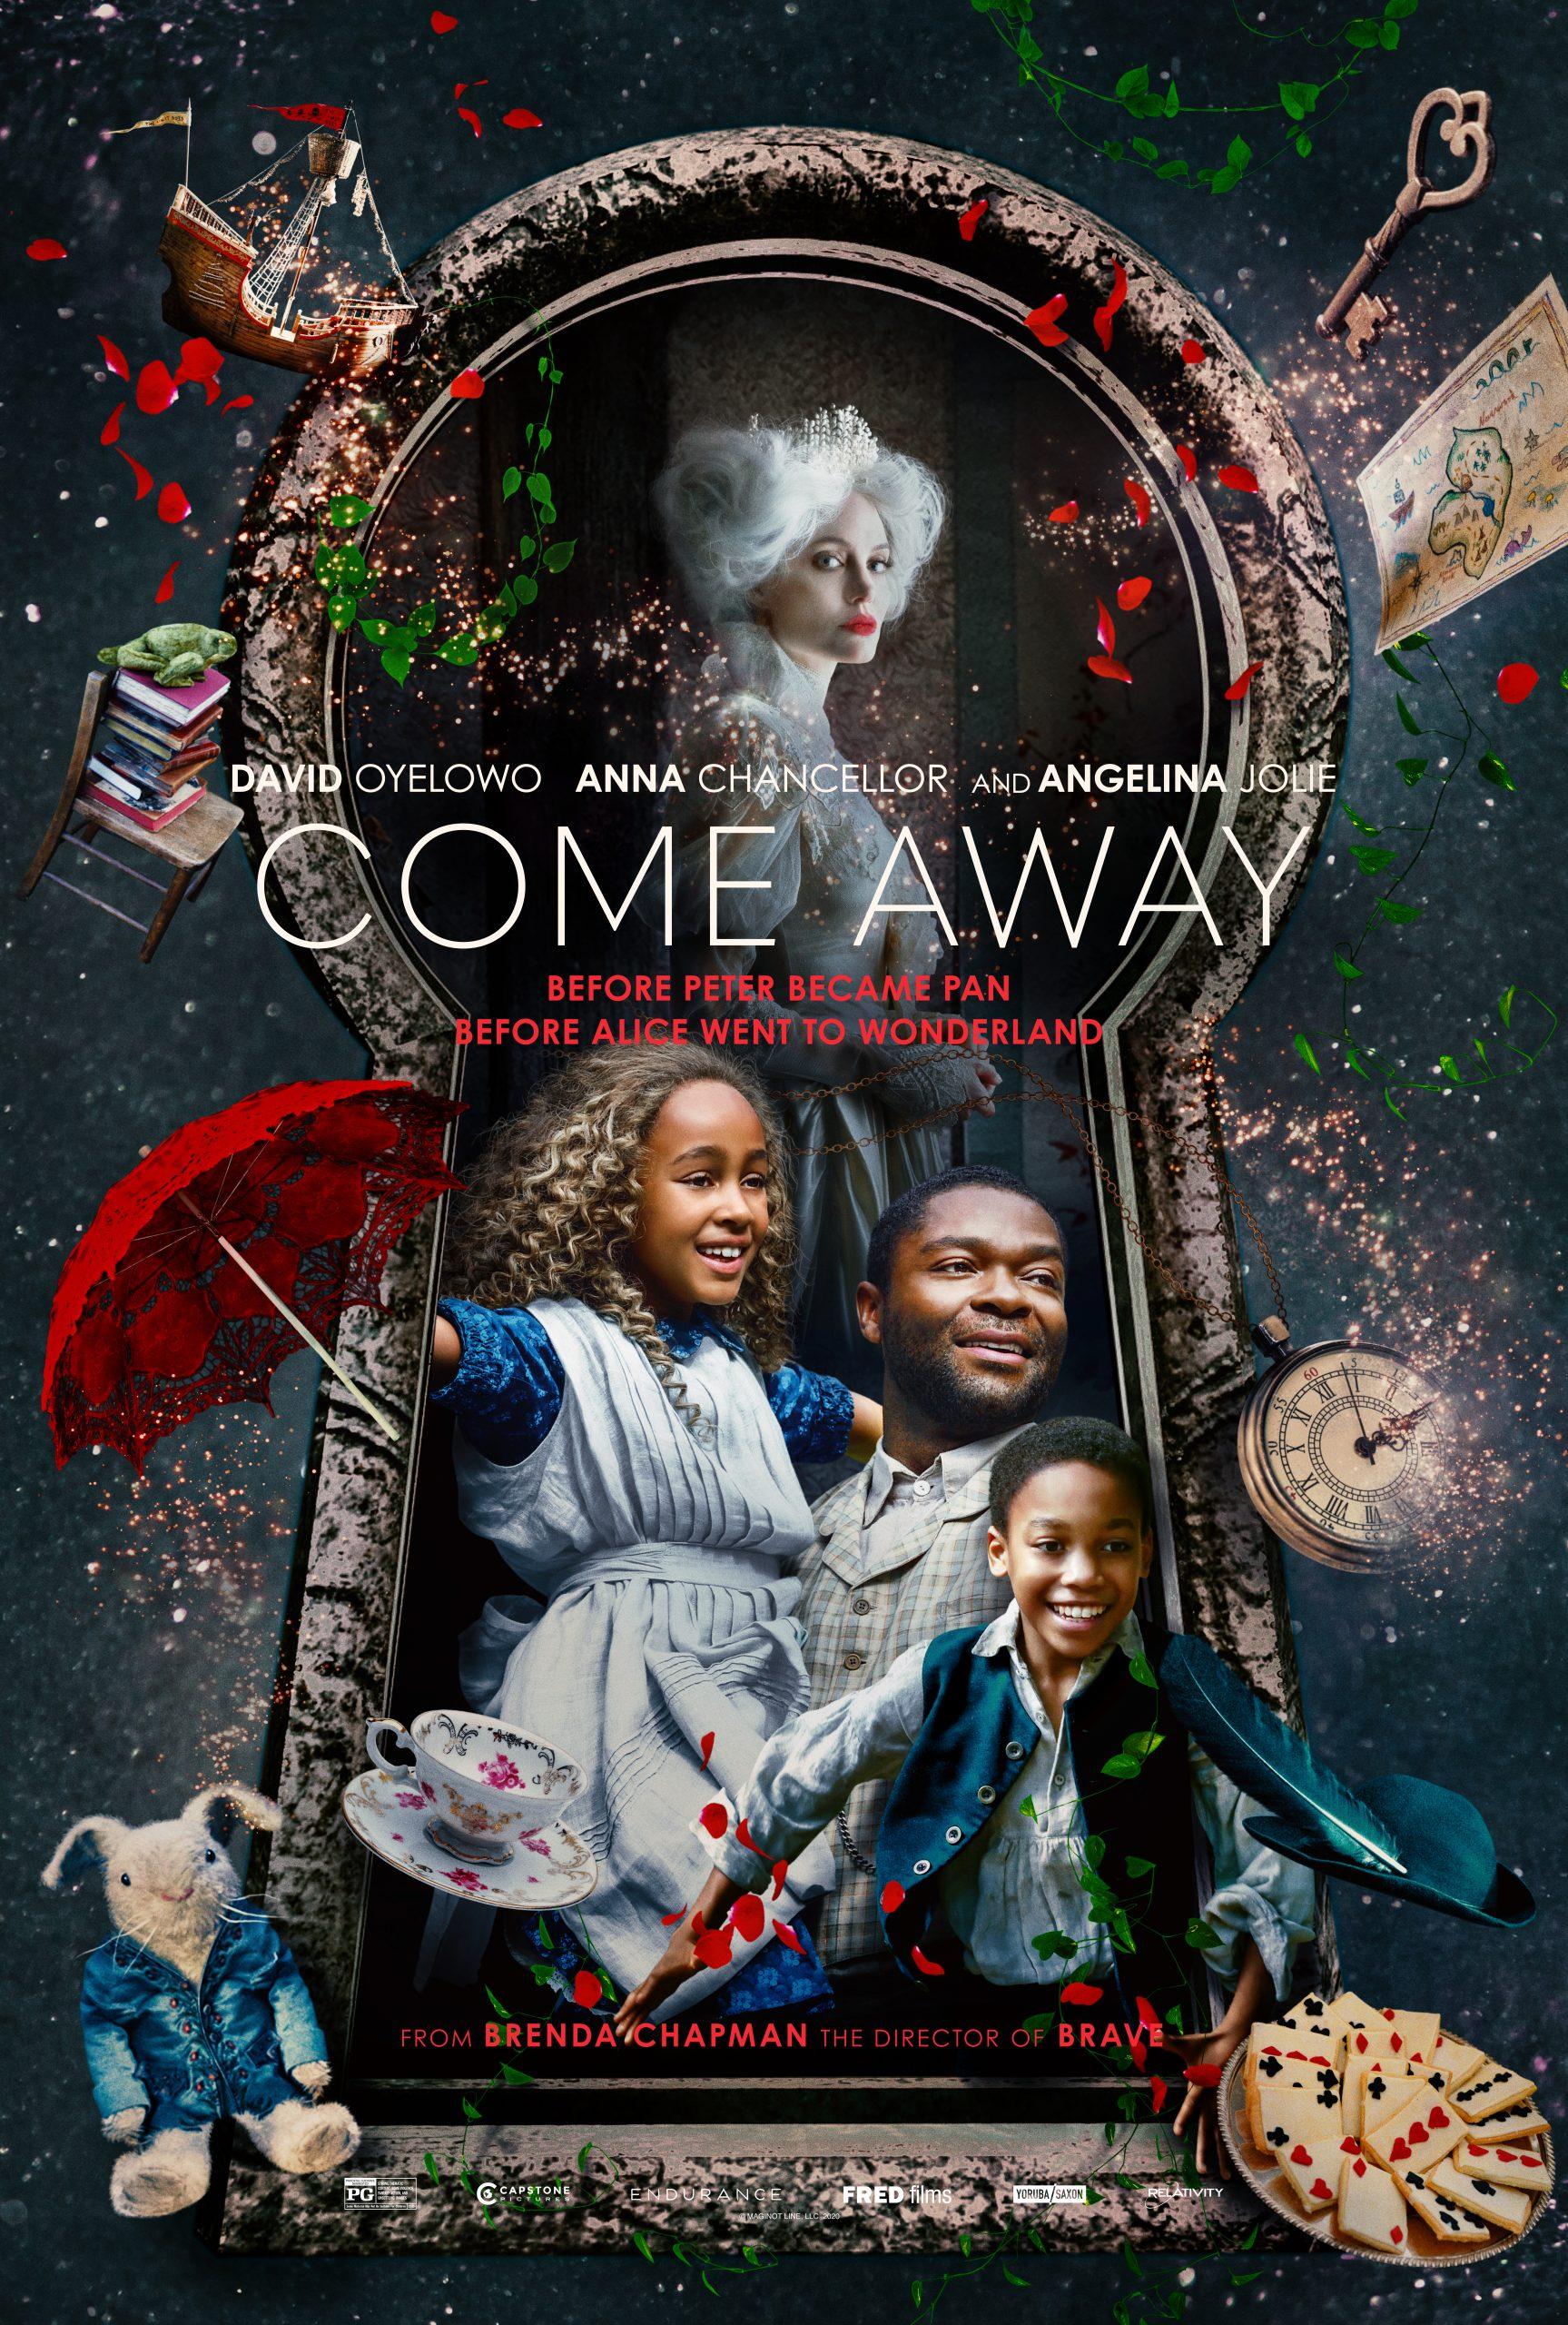 New Movie: COME AWAY Starring David Oyelowo, Anna Chancellor, Gugu Mbatha-Raw, Angelina Jolie